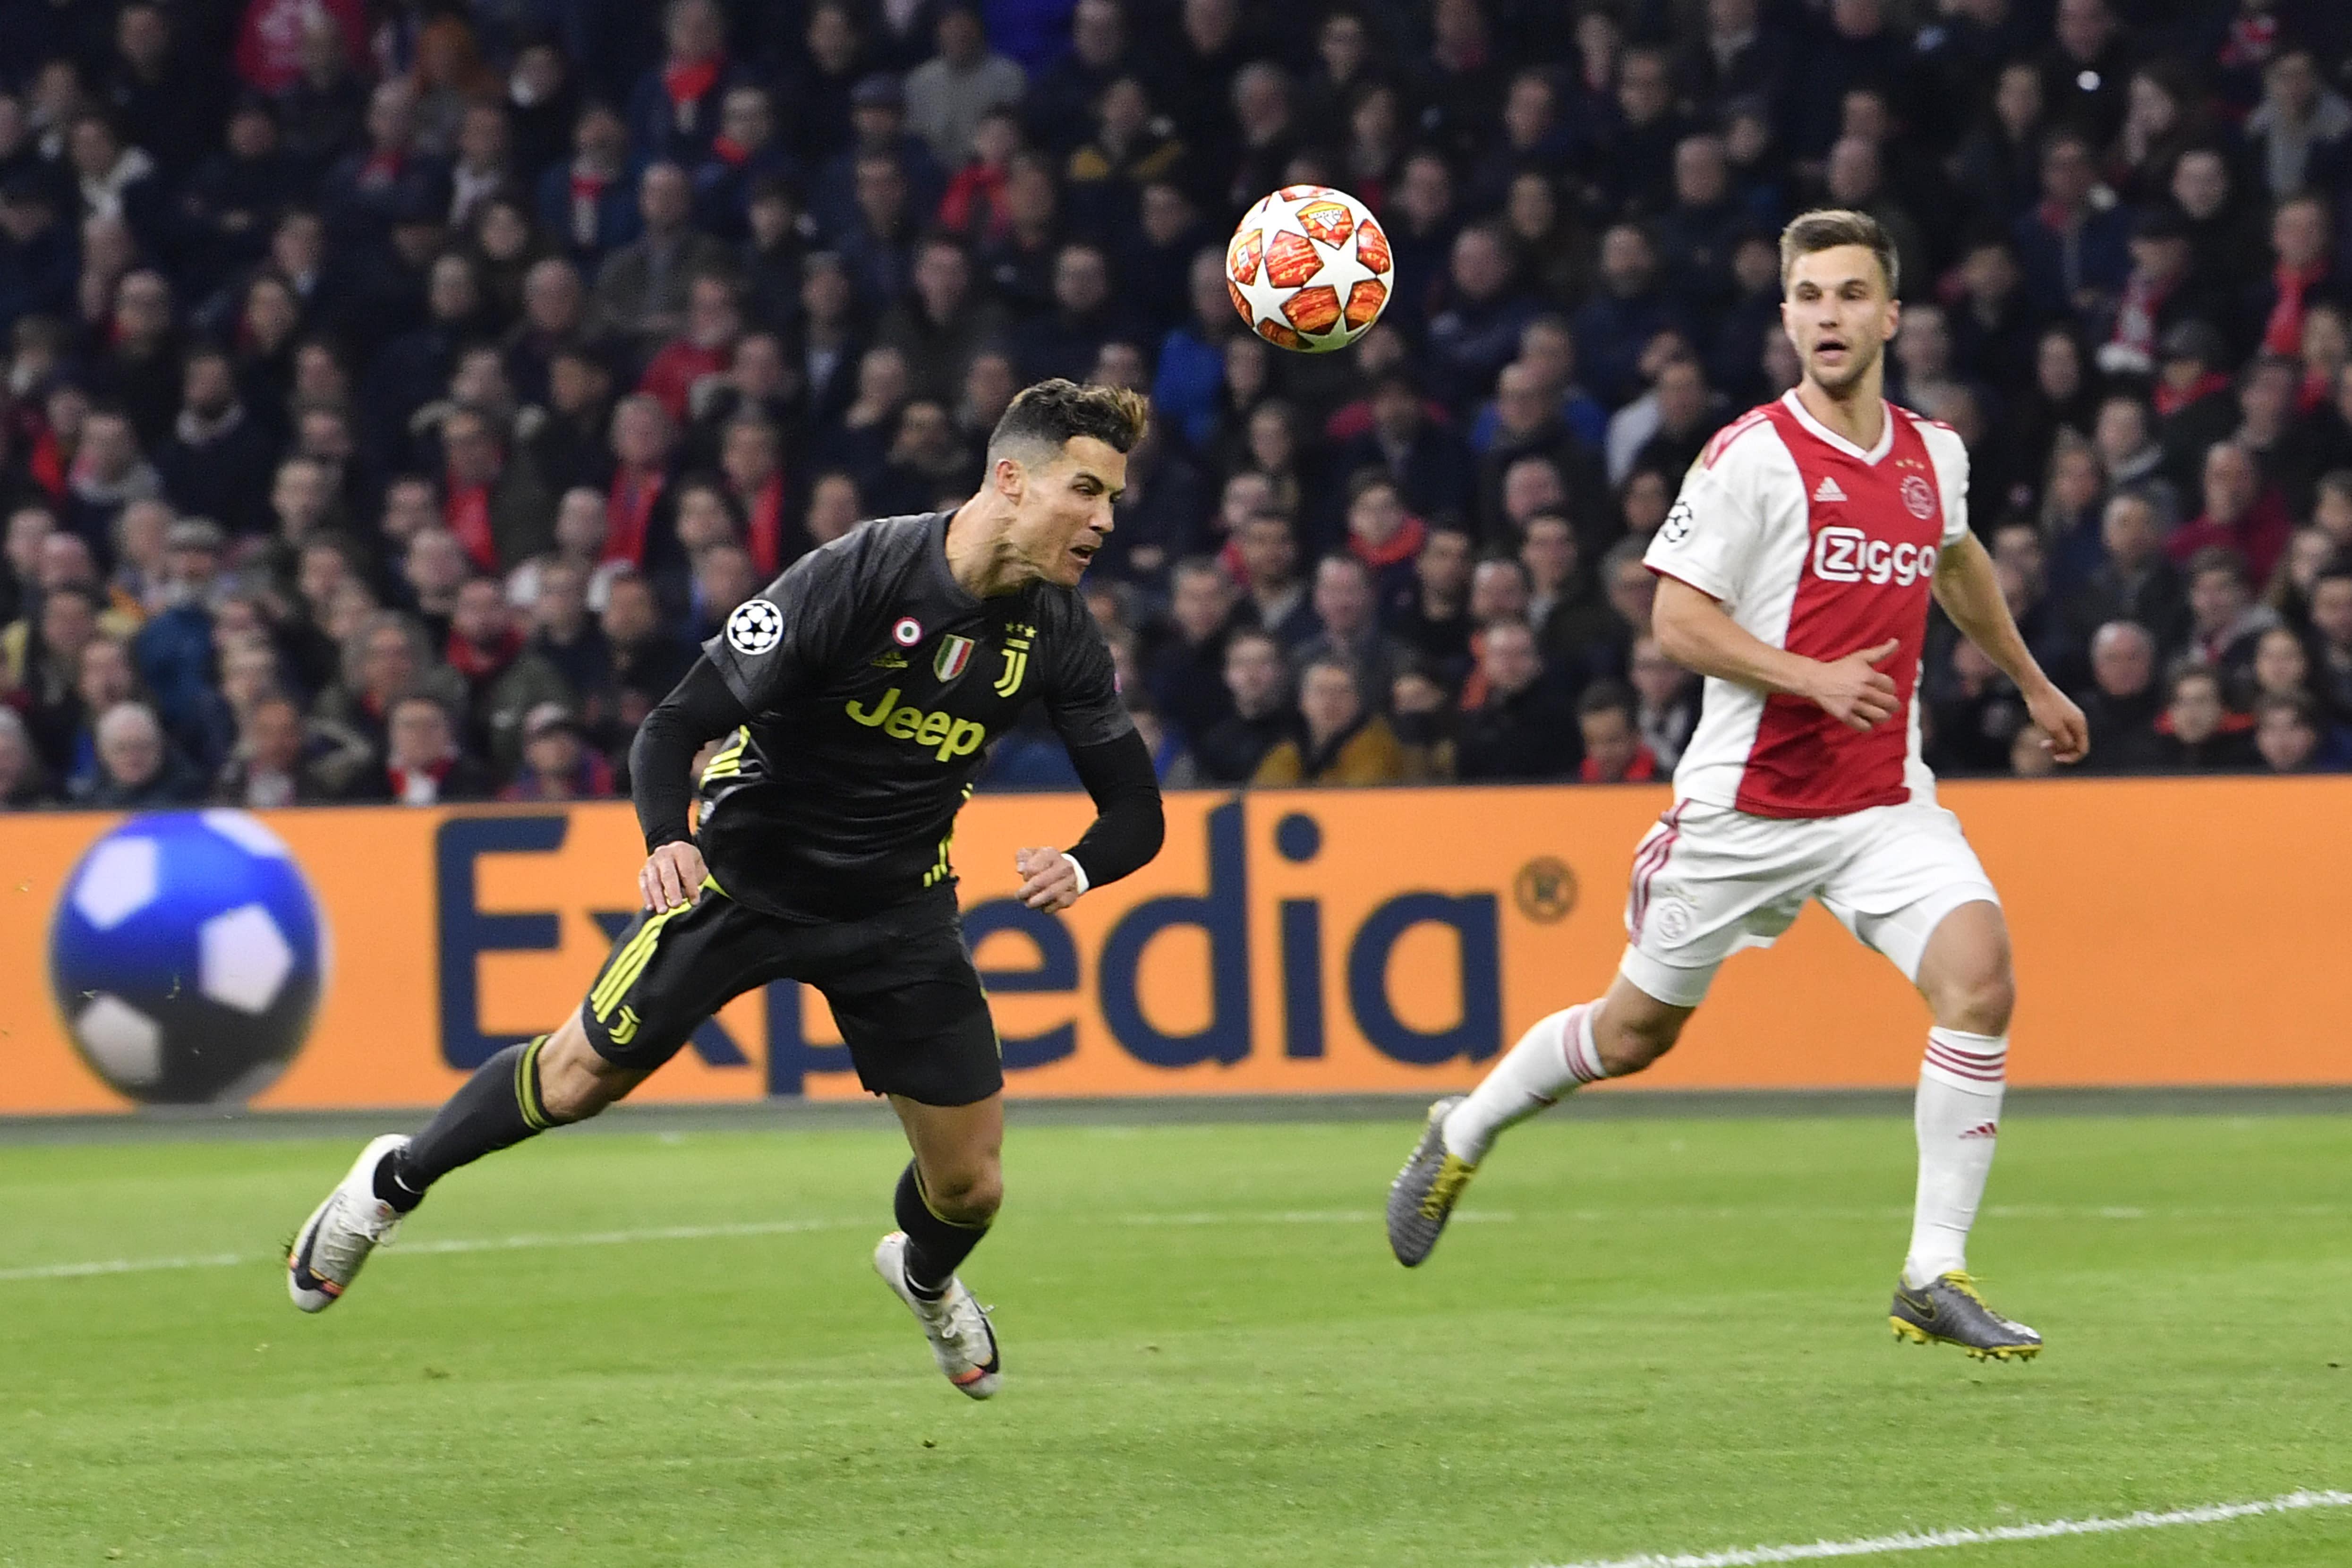 Ajax plays Ronaldo and Juventus tough in 1-1 draw